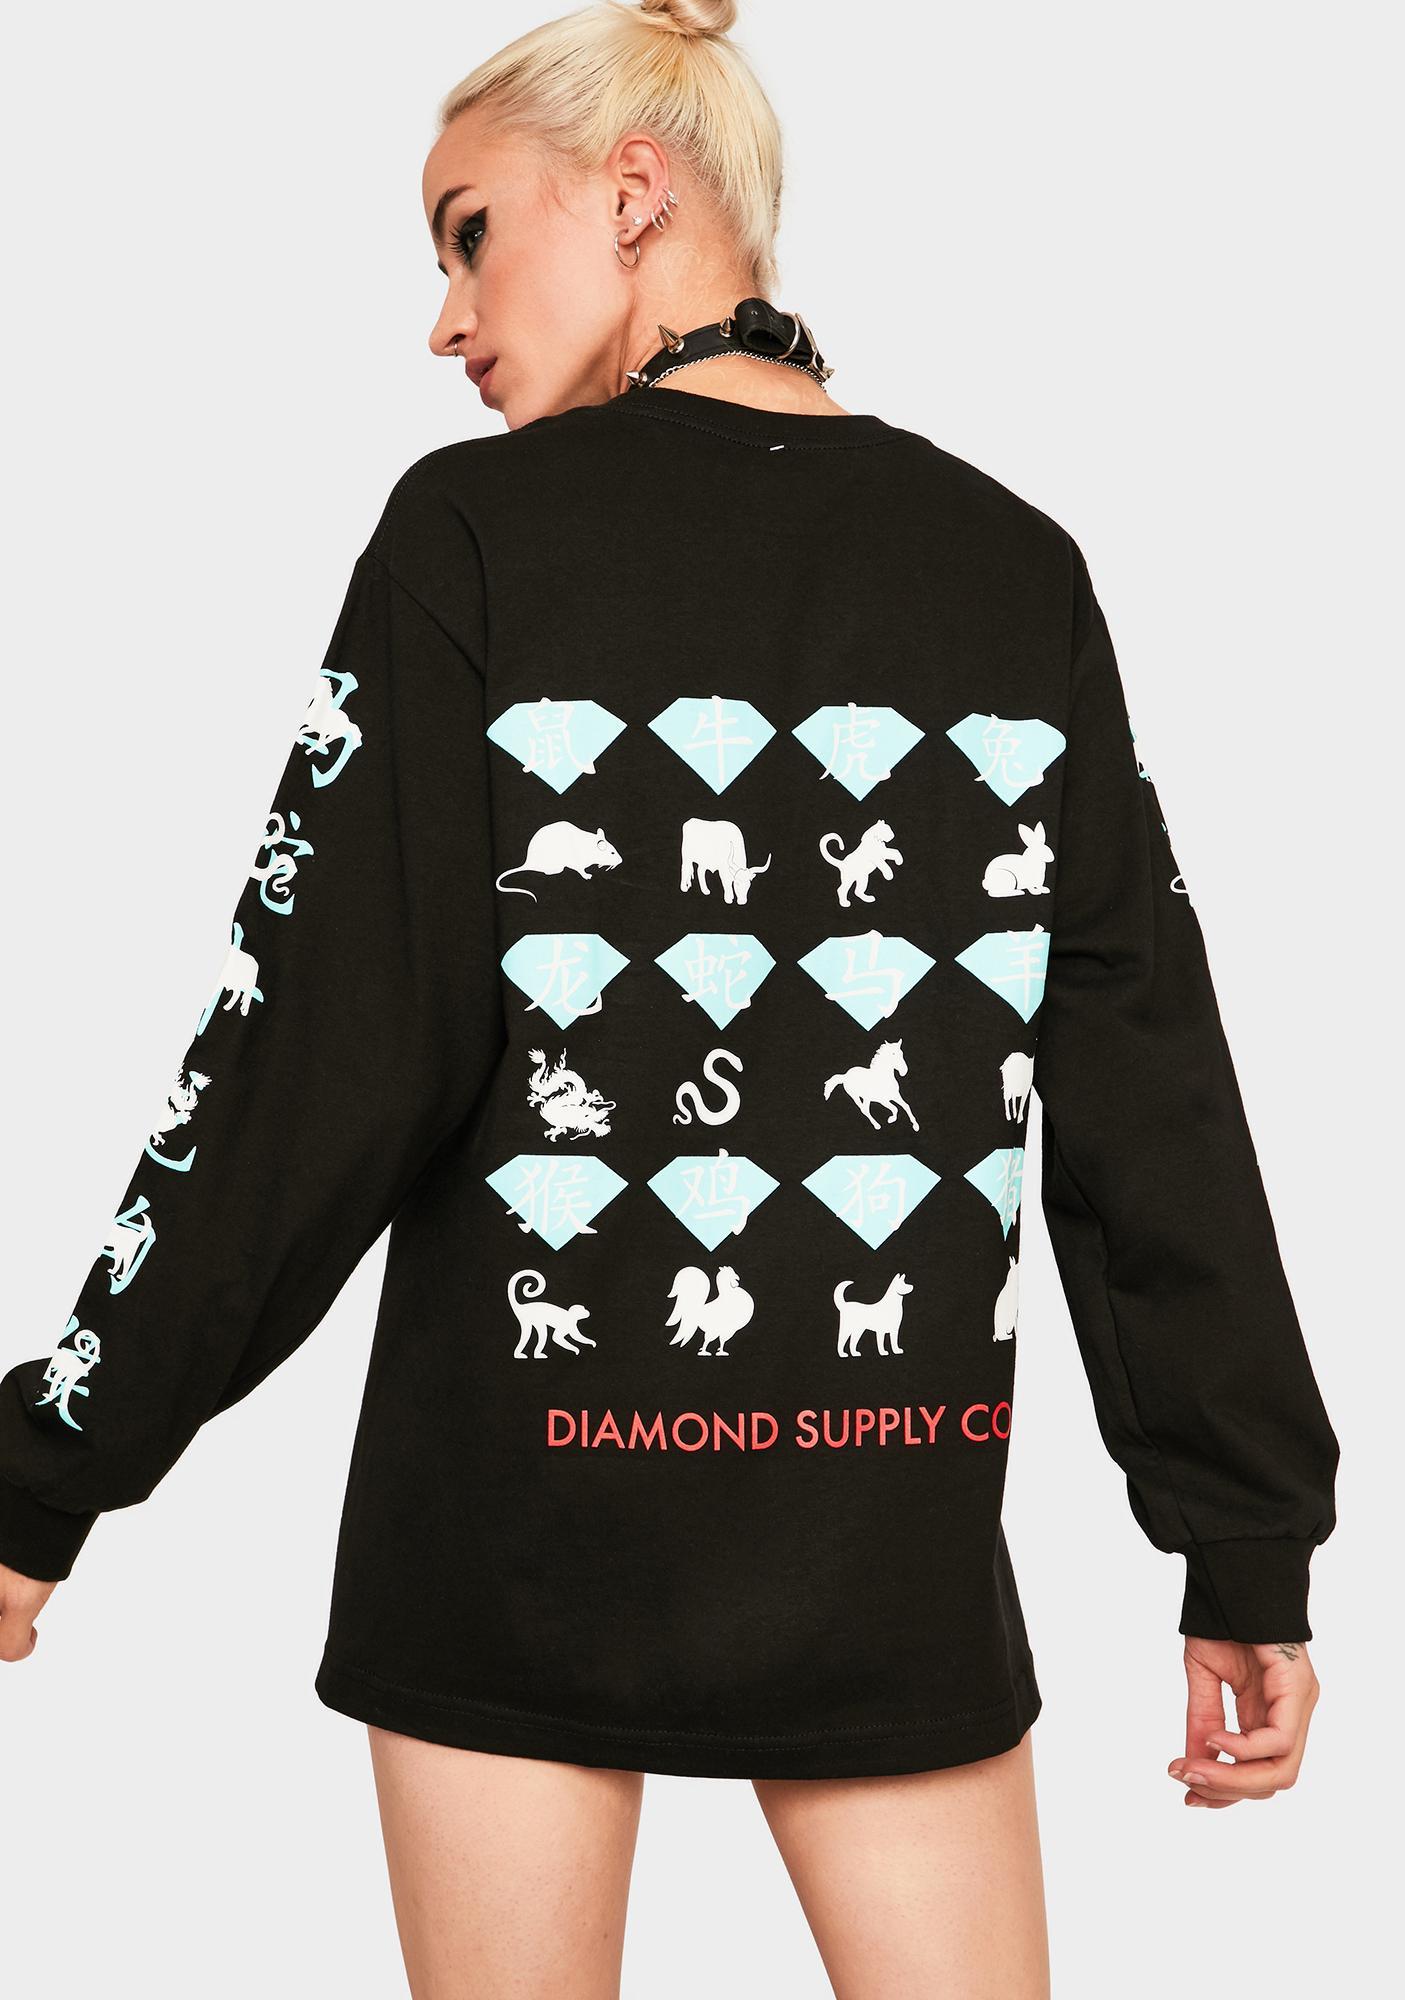 Diamond Supply Co Zodiac Long Sleeve Graphic Tee